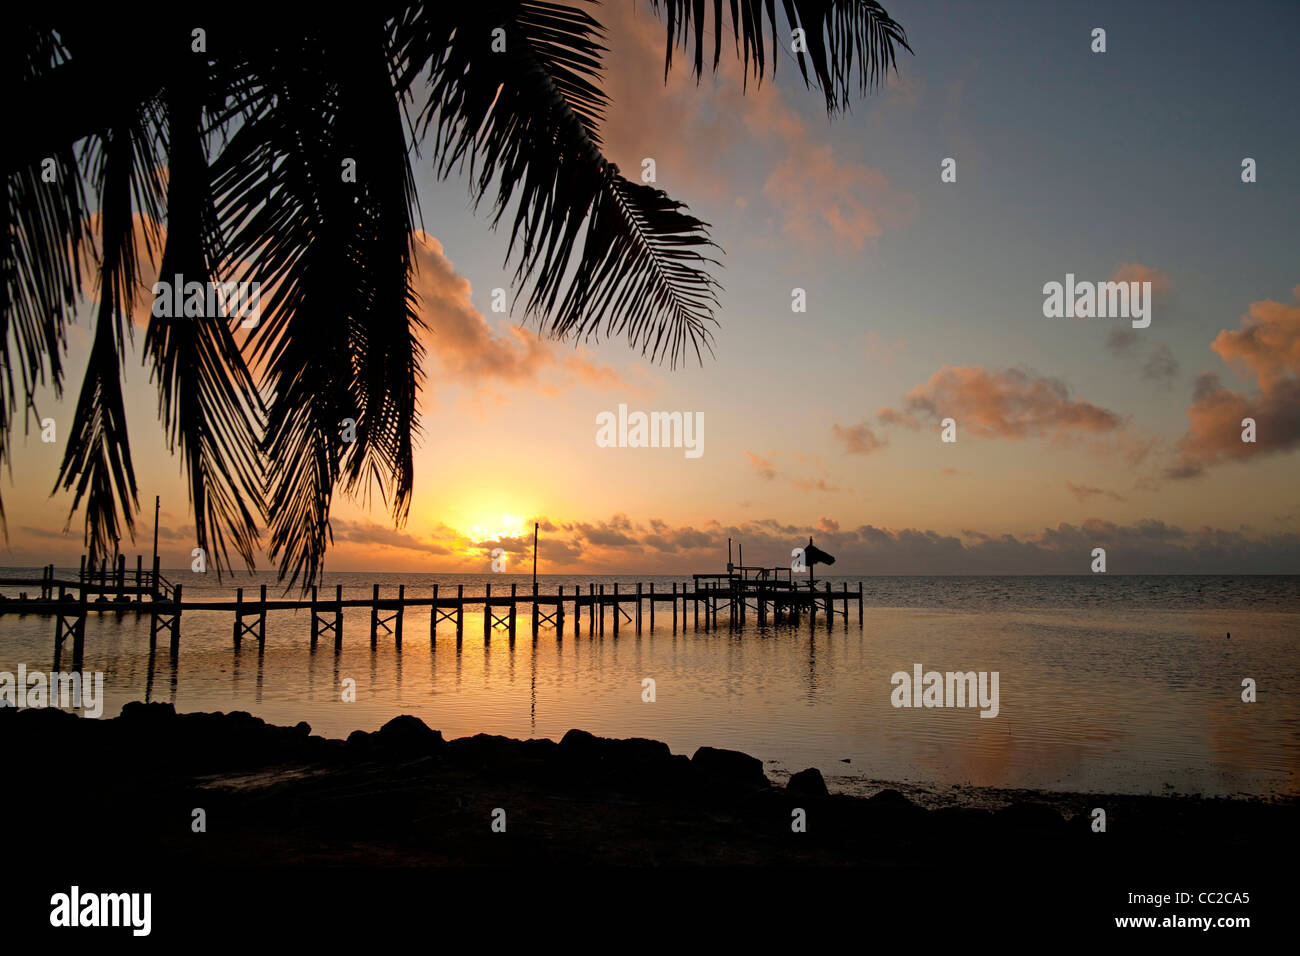 sunset at a pier in Marathon, Florida Keys, Florida, USA Stock Photo